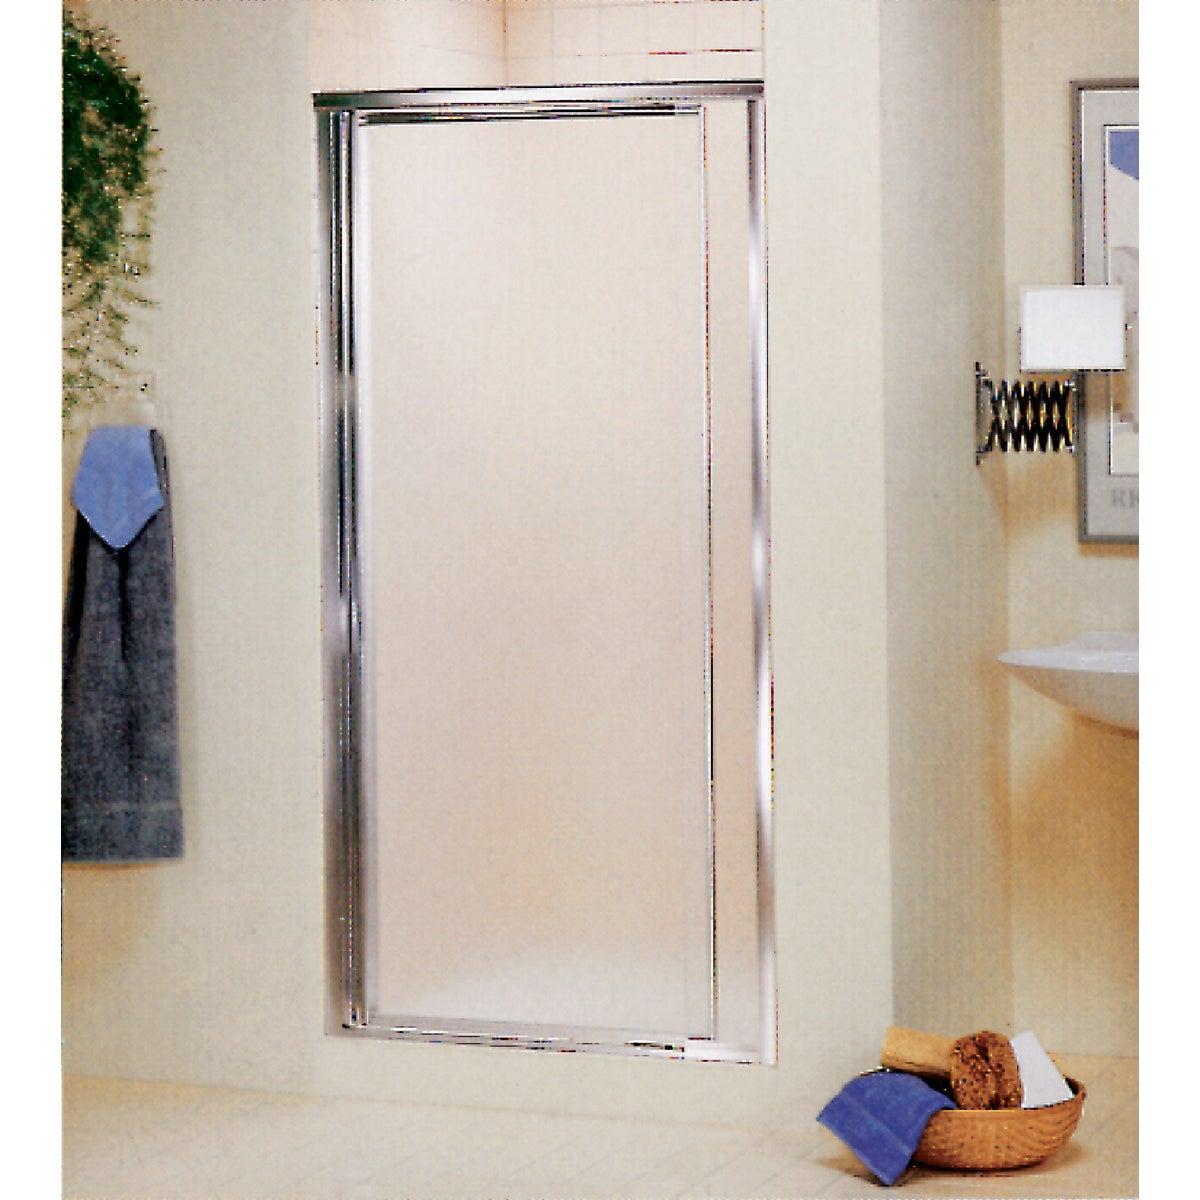 Sterling SILVER PIVOT SHOWER DOOR 1500D-31S